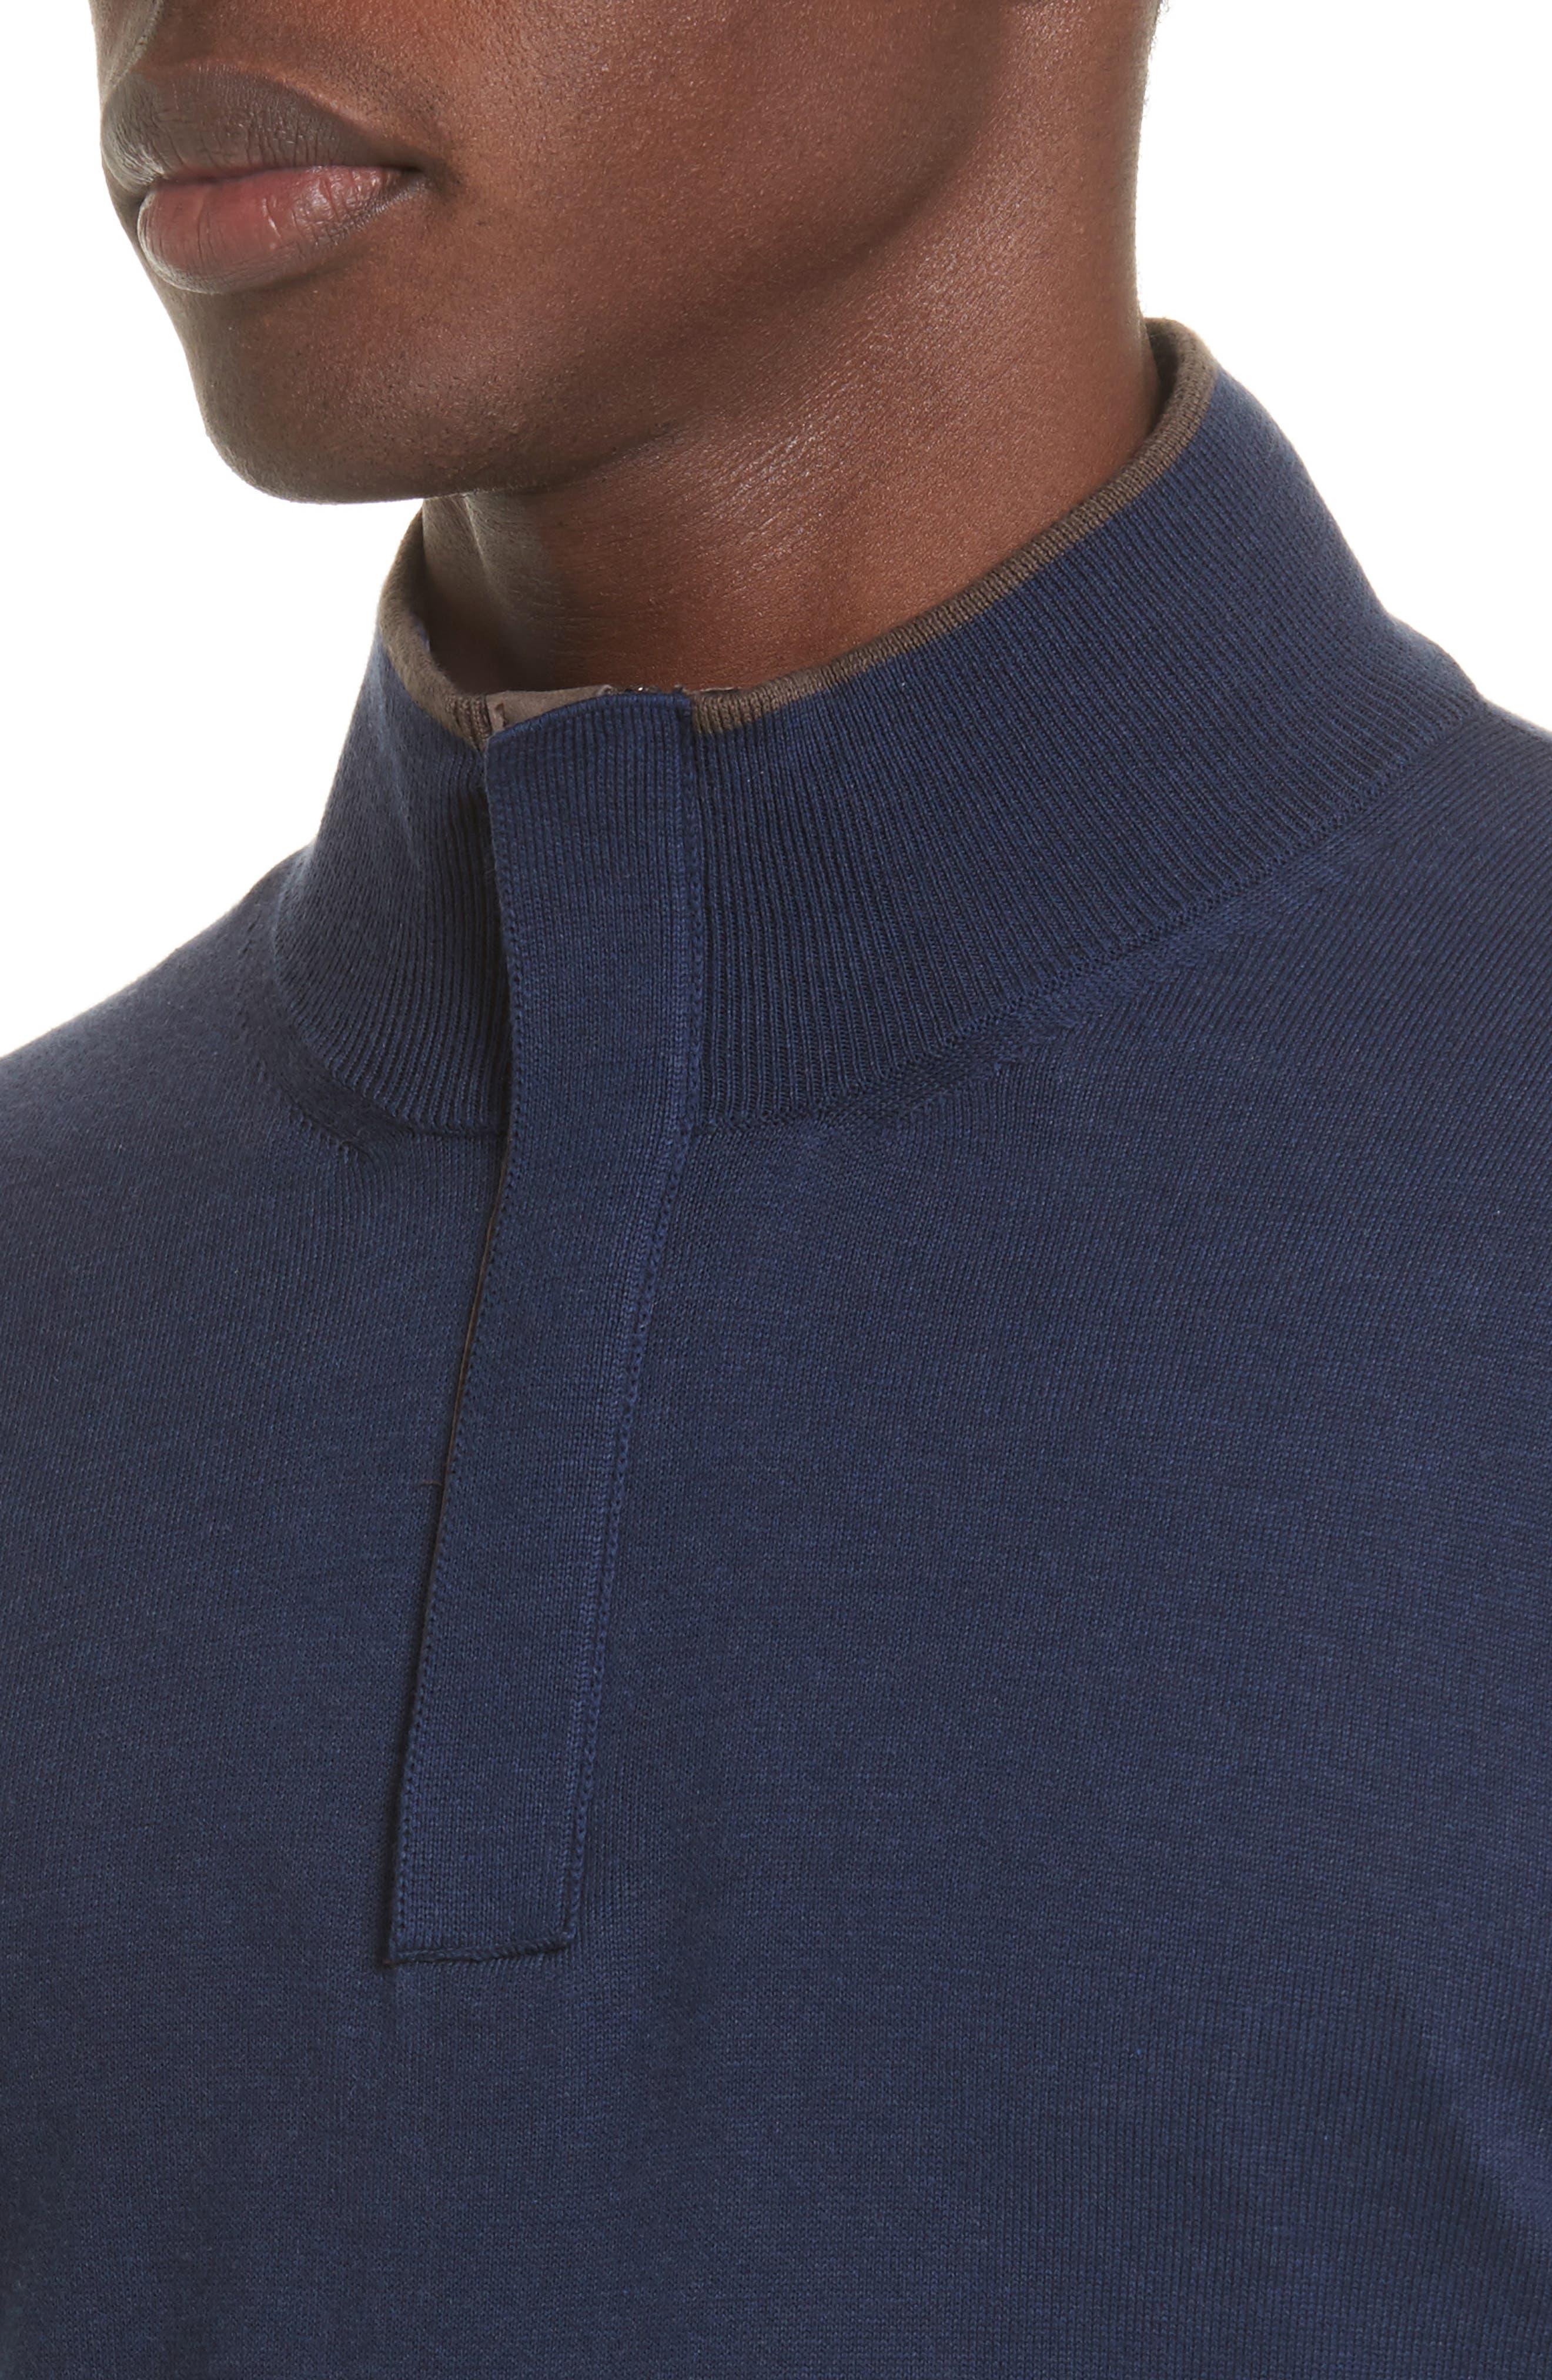 Quarter Zip Sweater,                             Alternate thumbnail 4, color,                             401